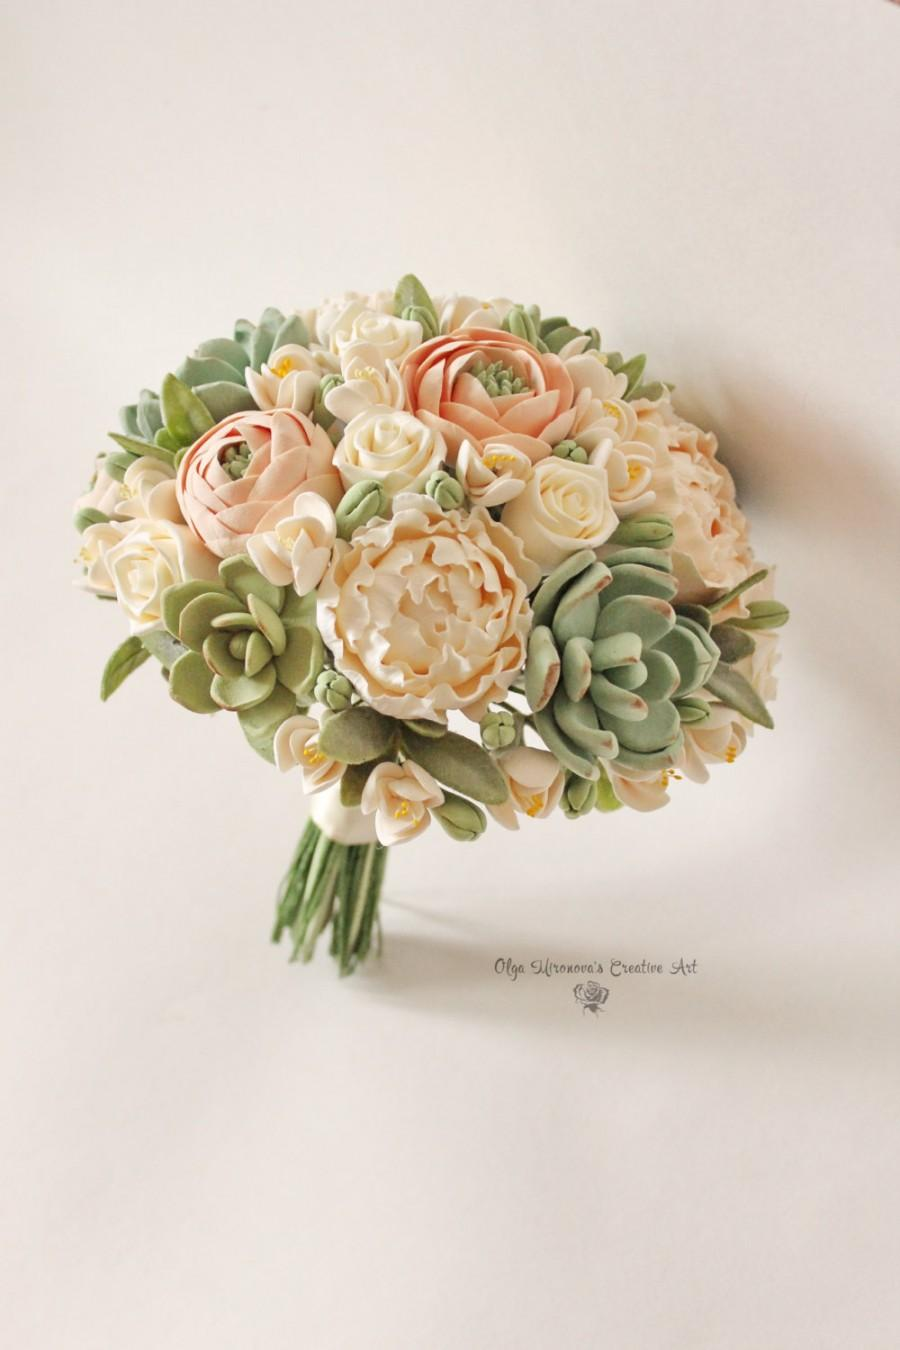 Set Peach Blush Peonies Green Succulents Bridal Bouquet Clay Flowers